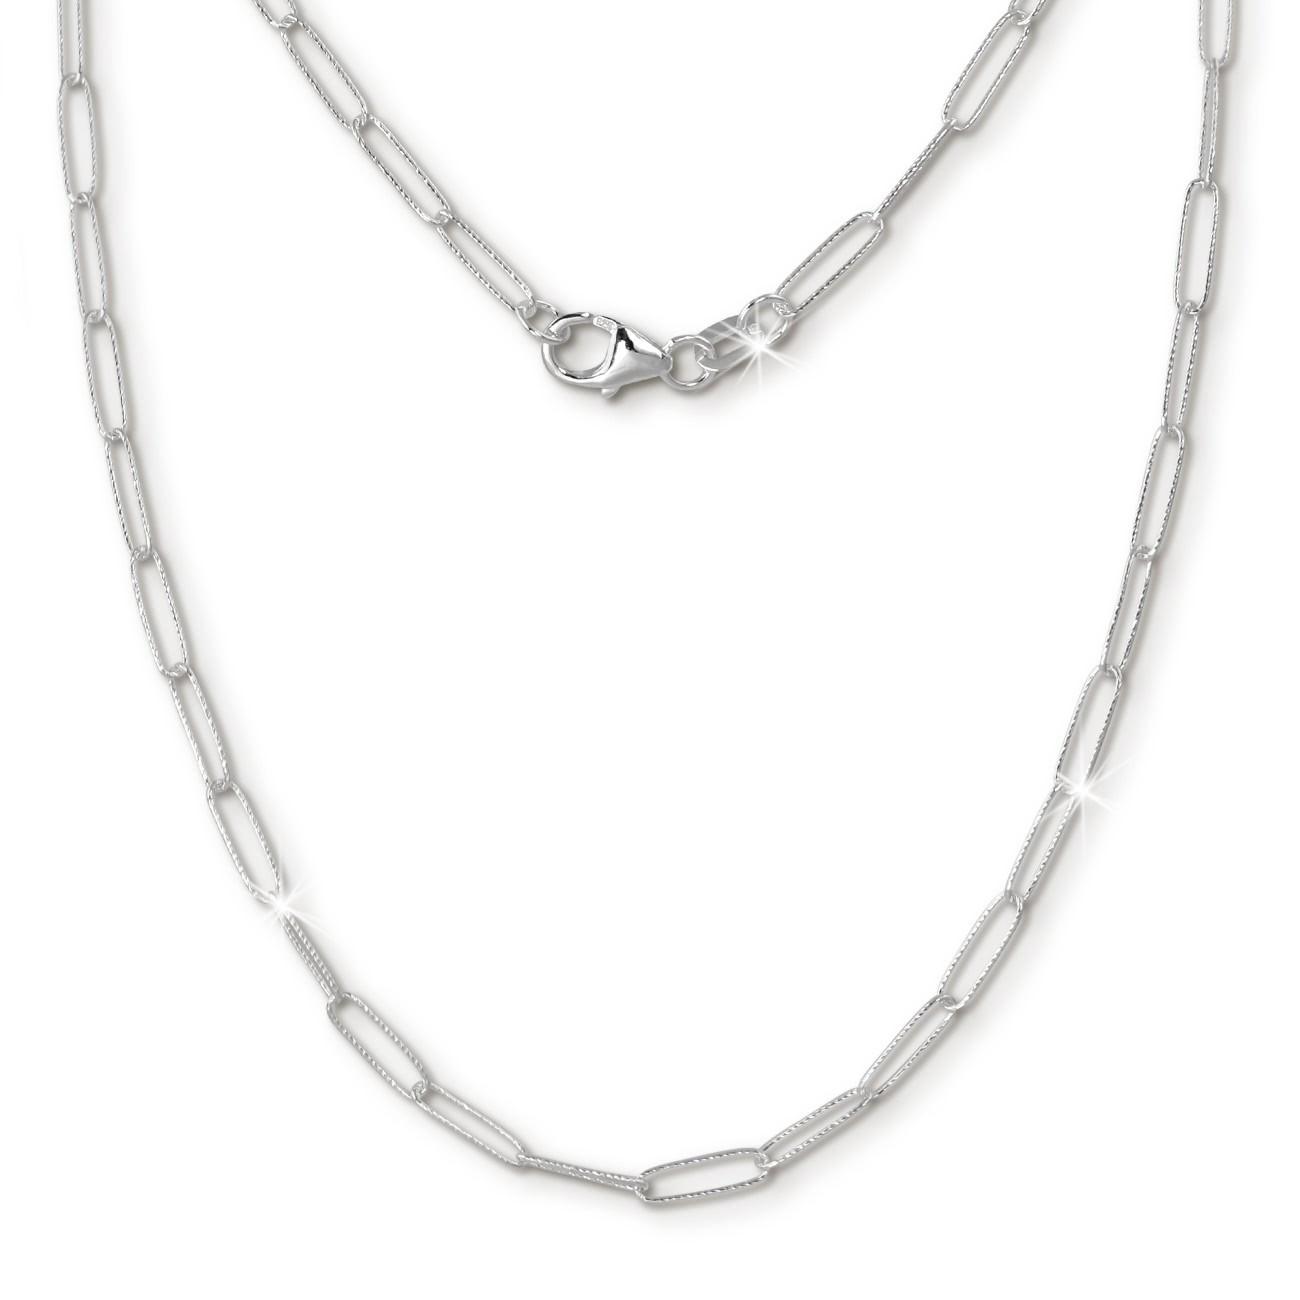 SilberDream Anker weit Kette 925 Sterling Silber Damen 45cm SDK28045J